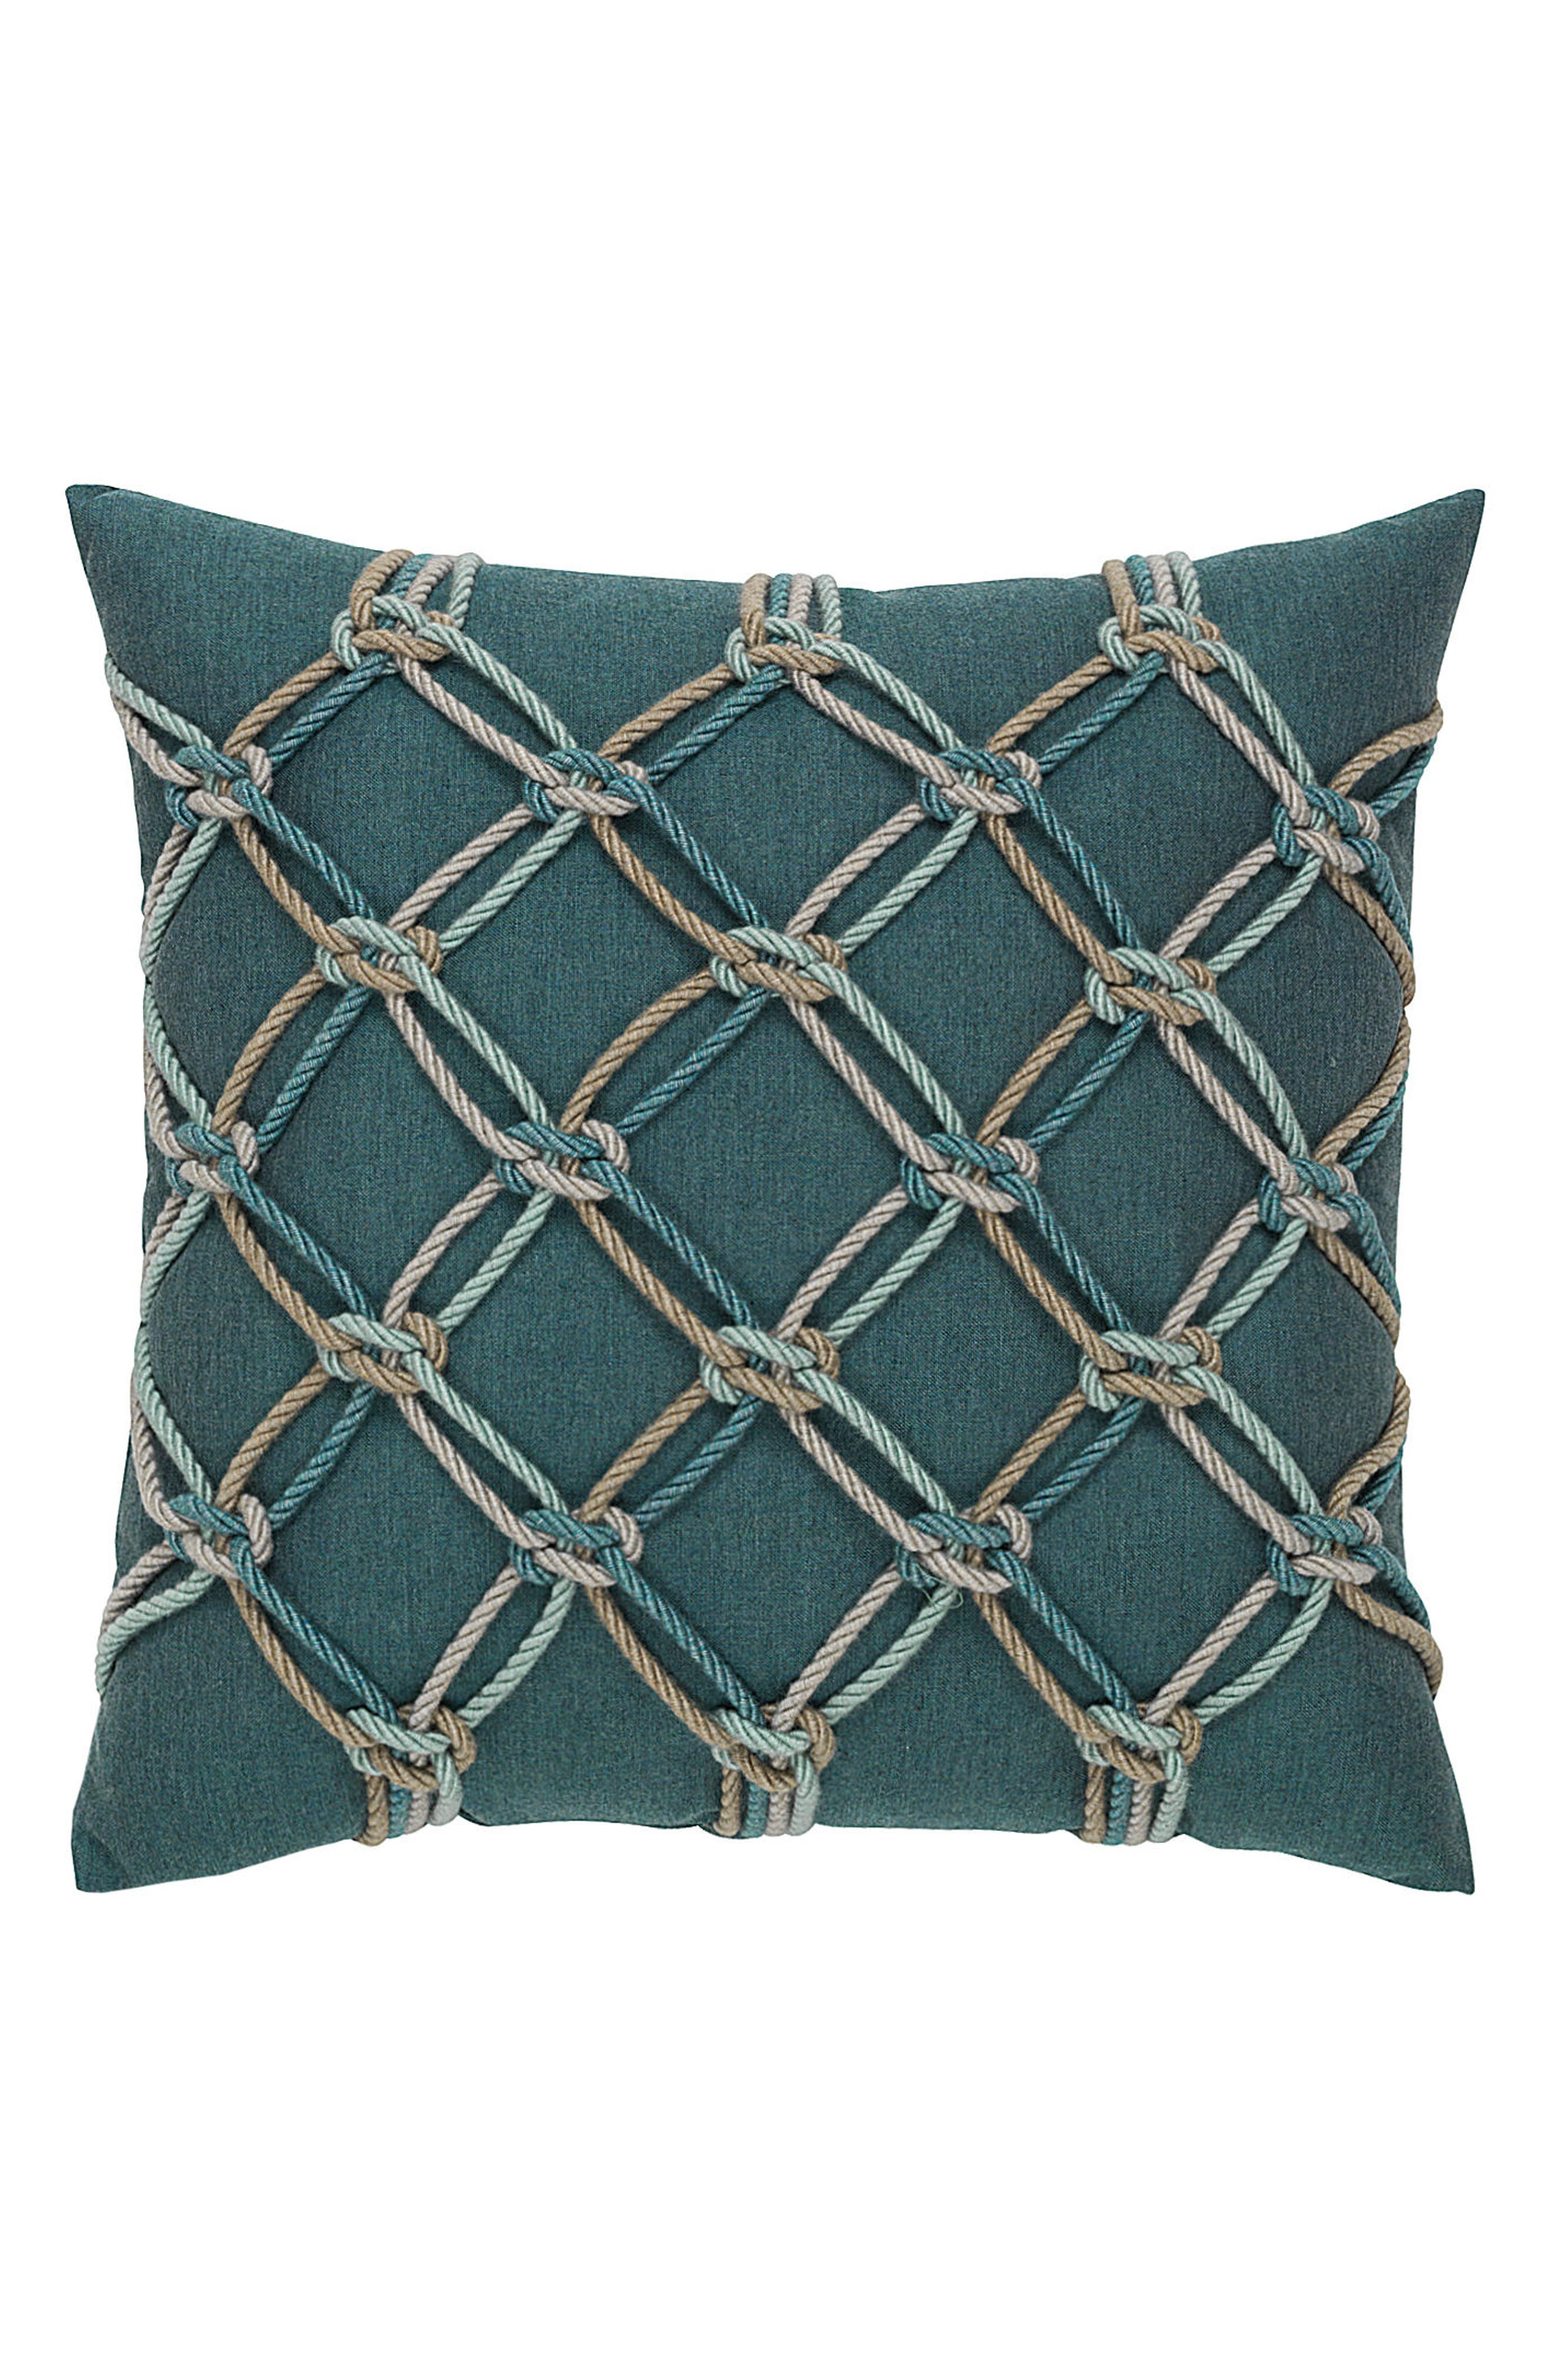 Elaine Smith Lagoon Rope Indoor/Outdoor Accent Pillow